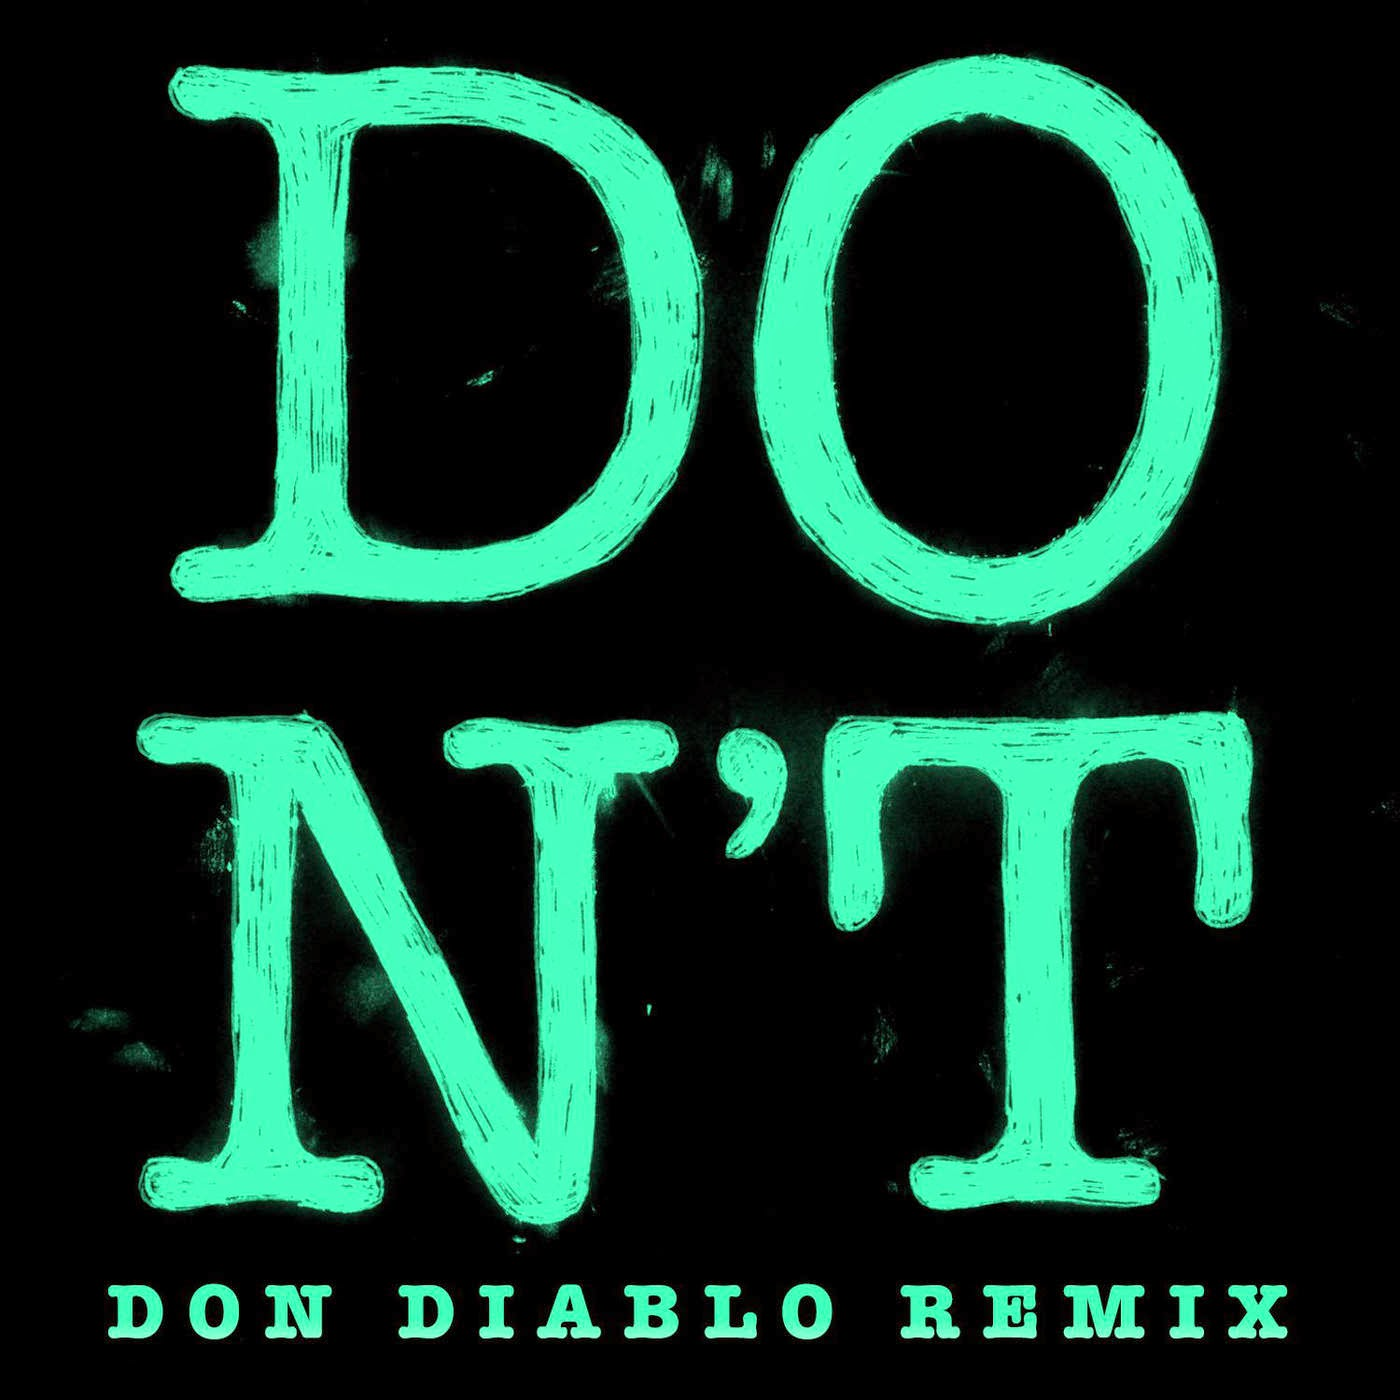 Ed Sheeran - Don't (Don Diablo Remix) - Single Cover